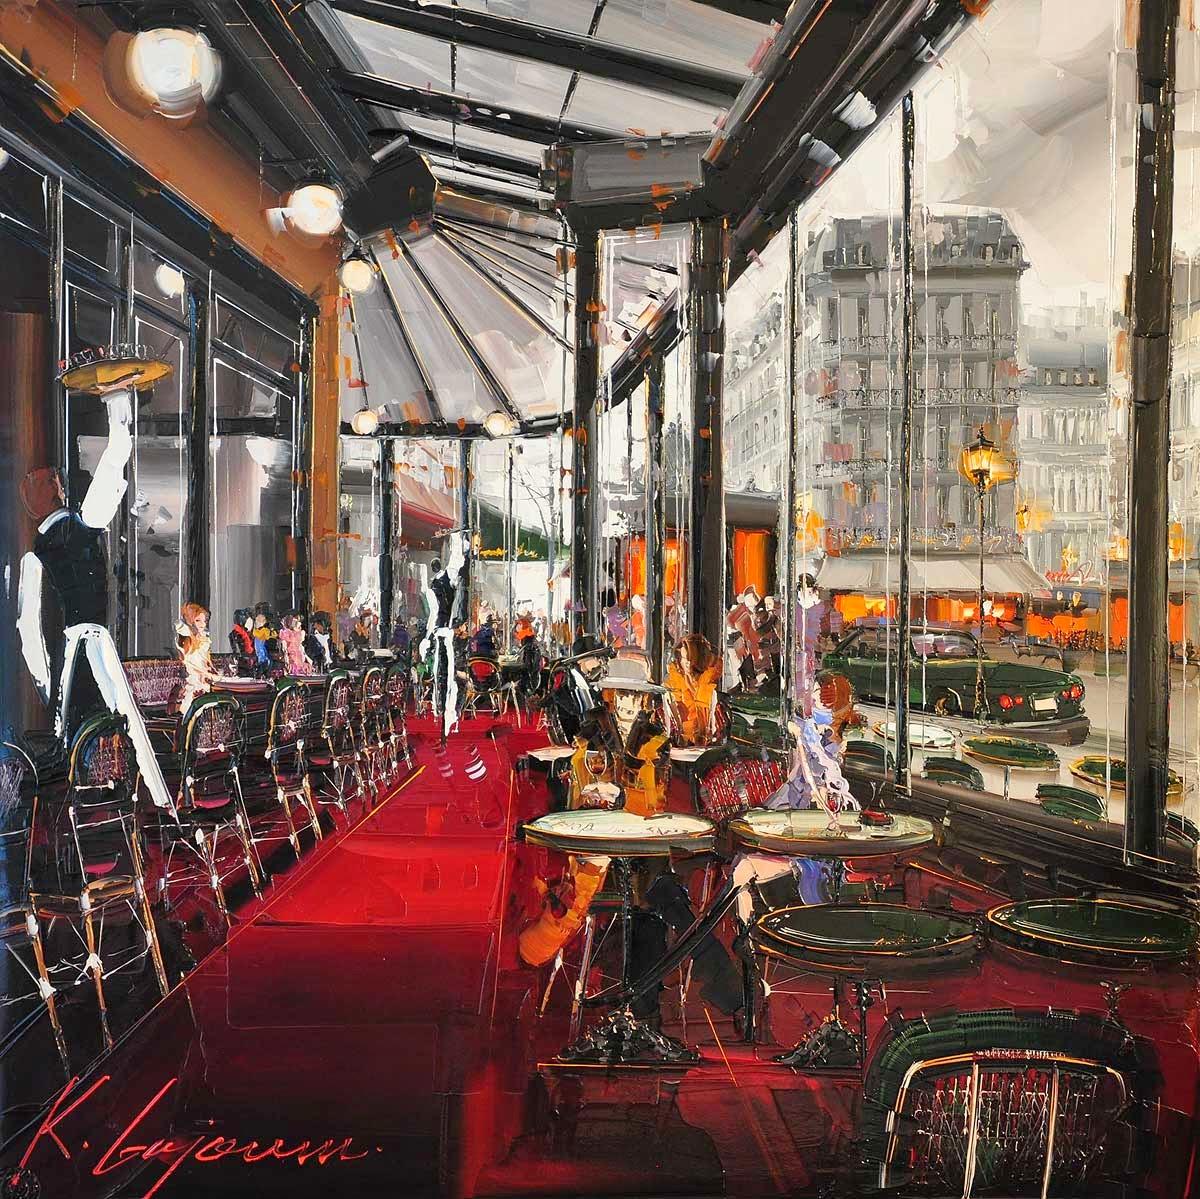 11-Café-de-Flore-Kal-Gajoum-Paintings-of-Dream-Like Cities-of-the-World-www-designstack-co